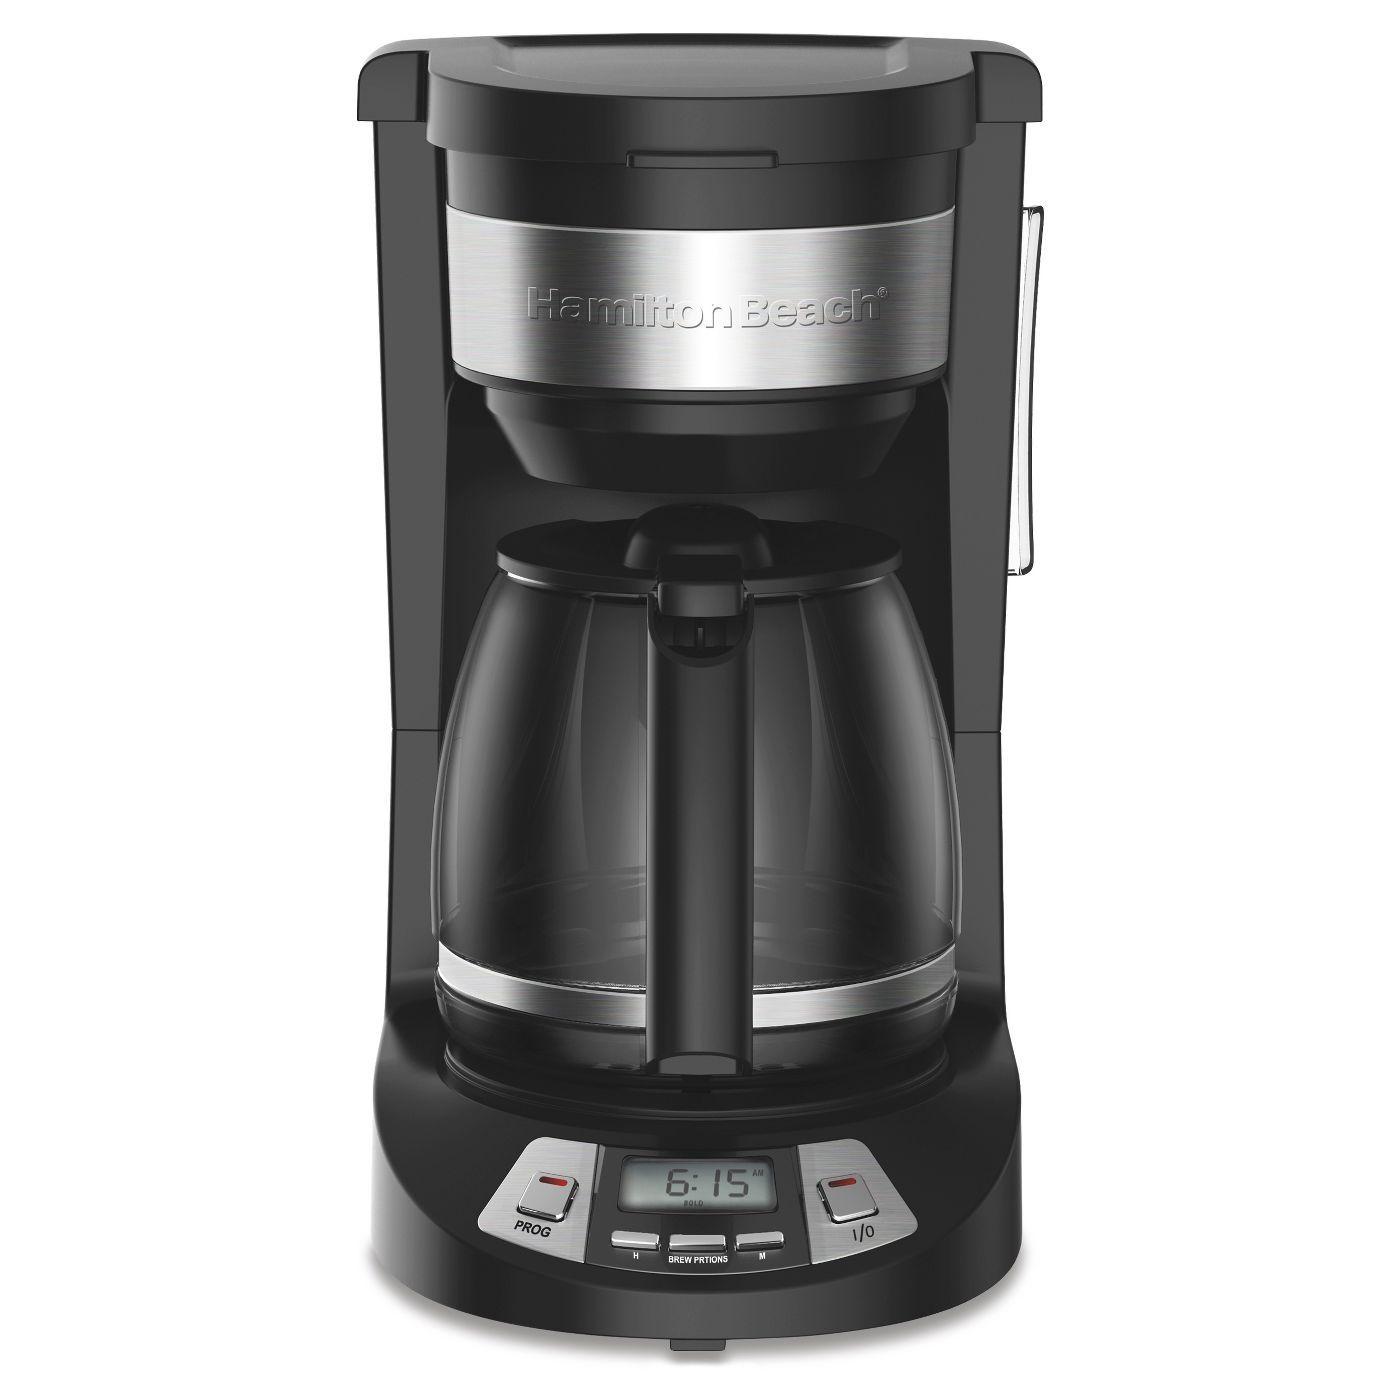 Hamilton Beach 12 Cup Programmable Coffee Maker - $36.99